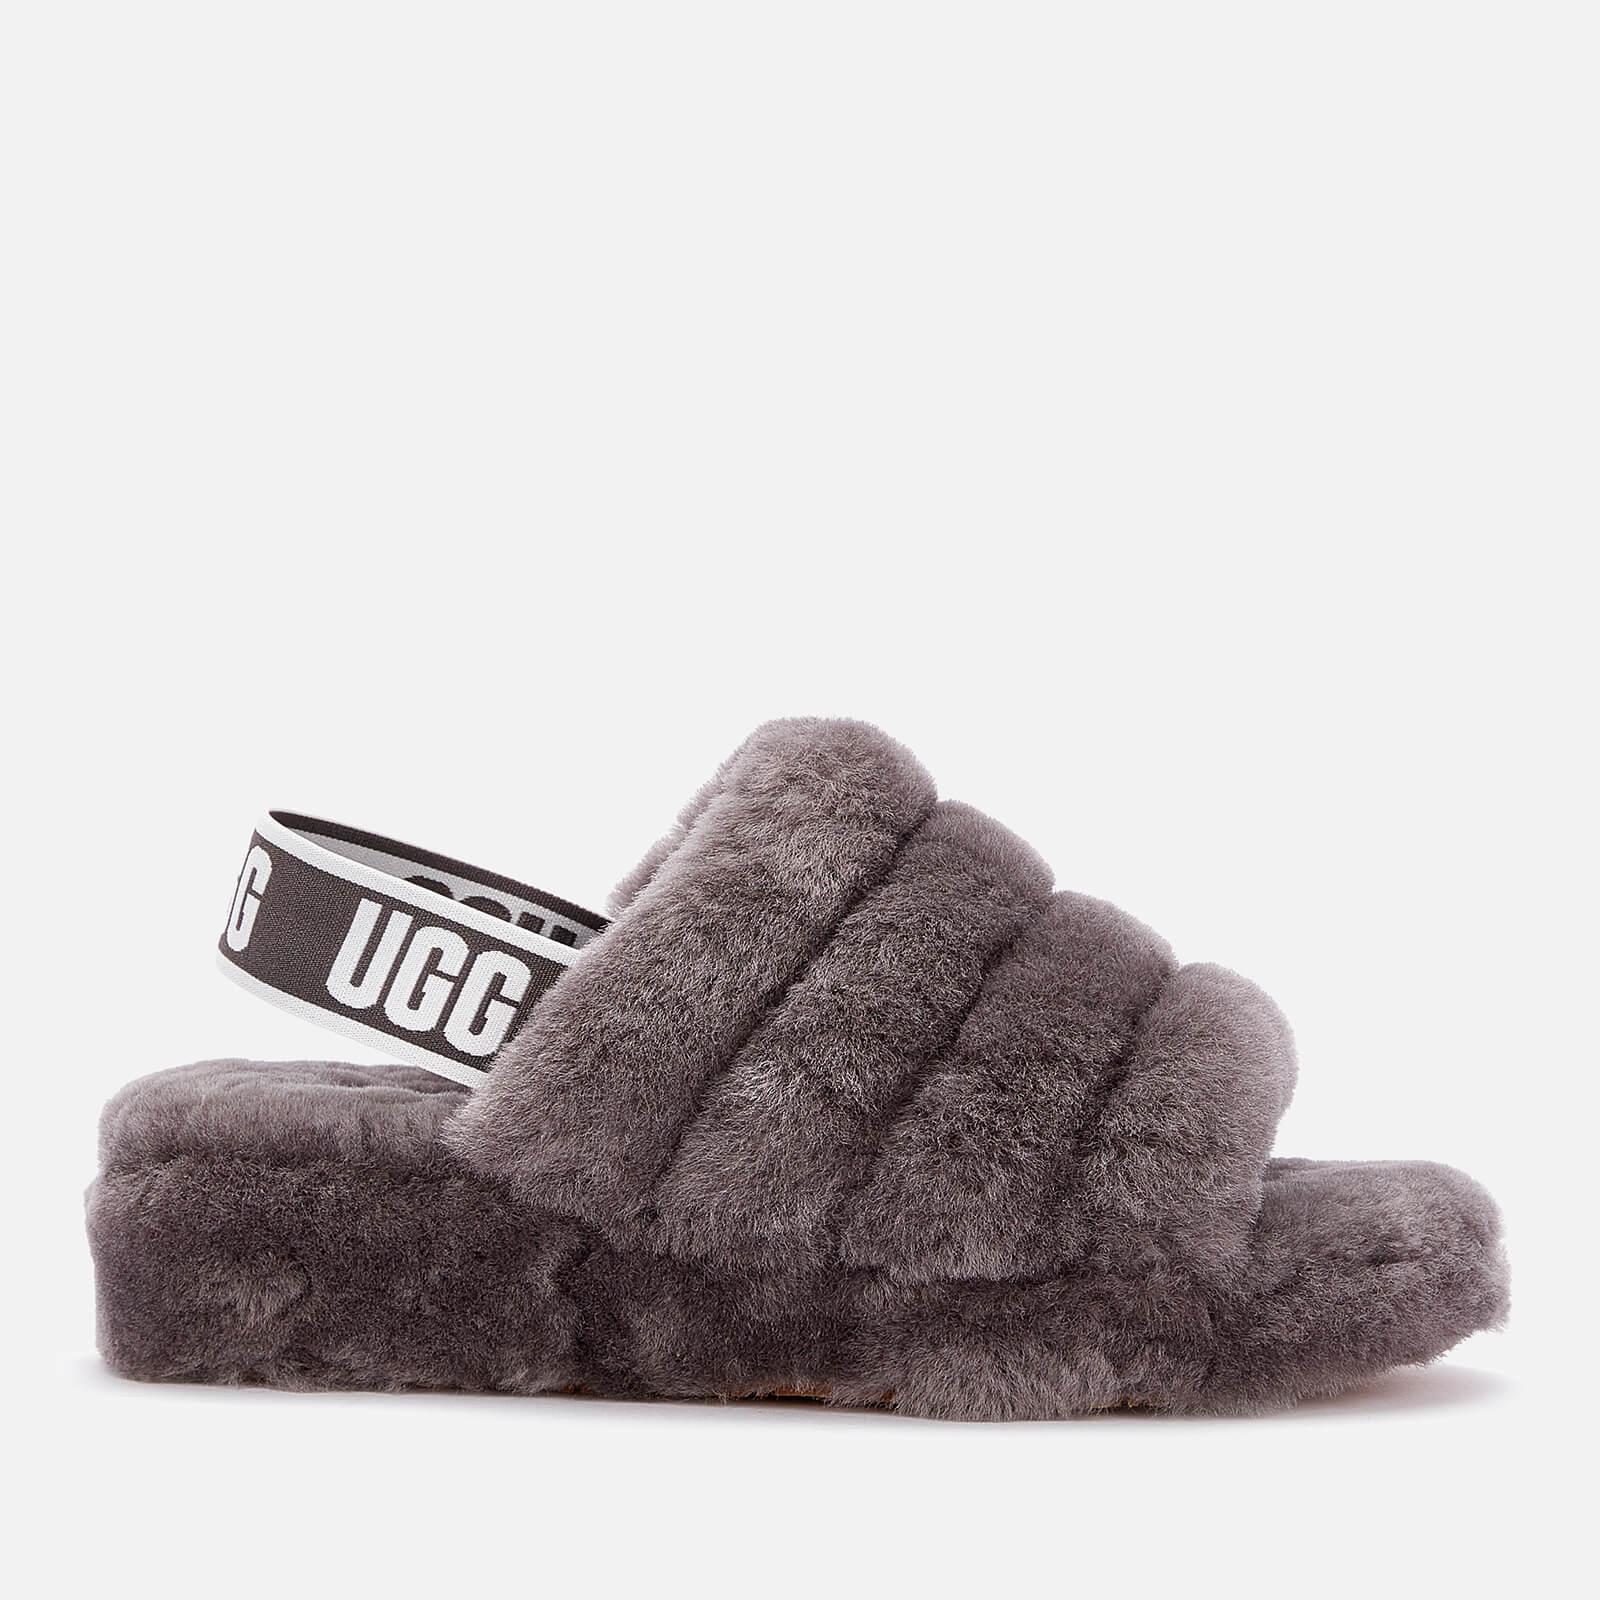 UGG Women's Fluff Yeah Slide Sheepskin Slippers - Charcoal - UK 7